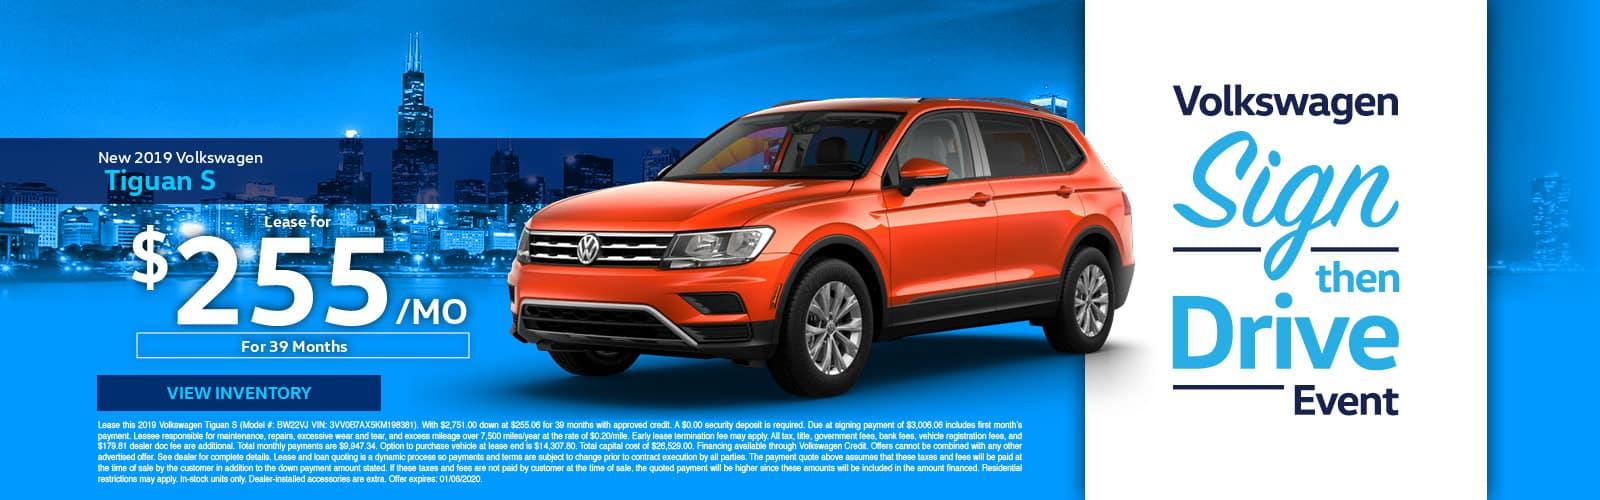 VW Dealer Chicago >> Volkswagen Of Downtown Chicago Auto Dealership Sales